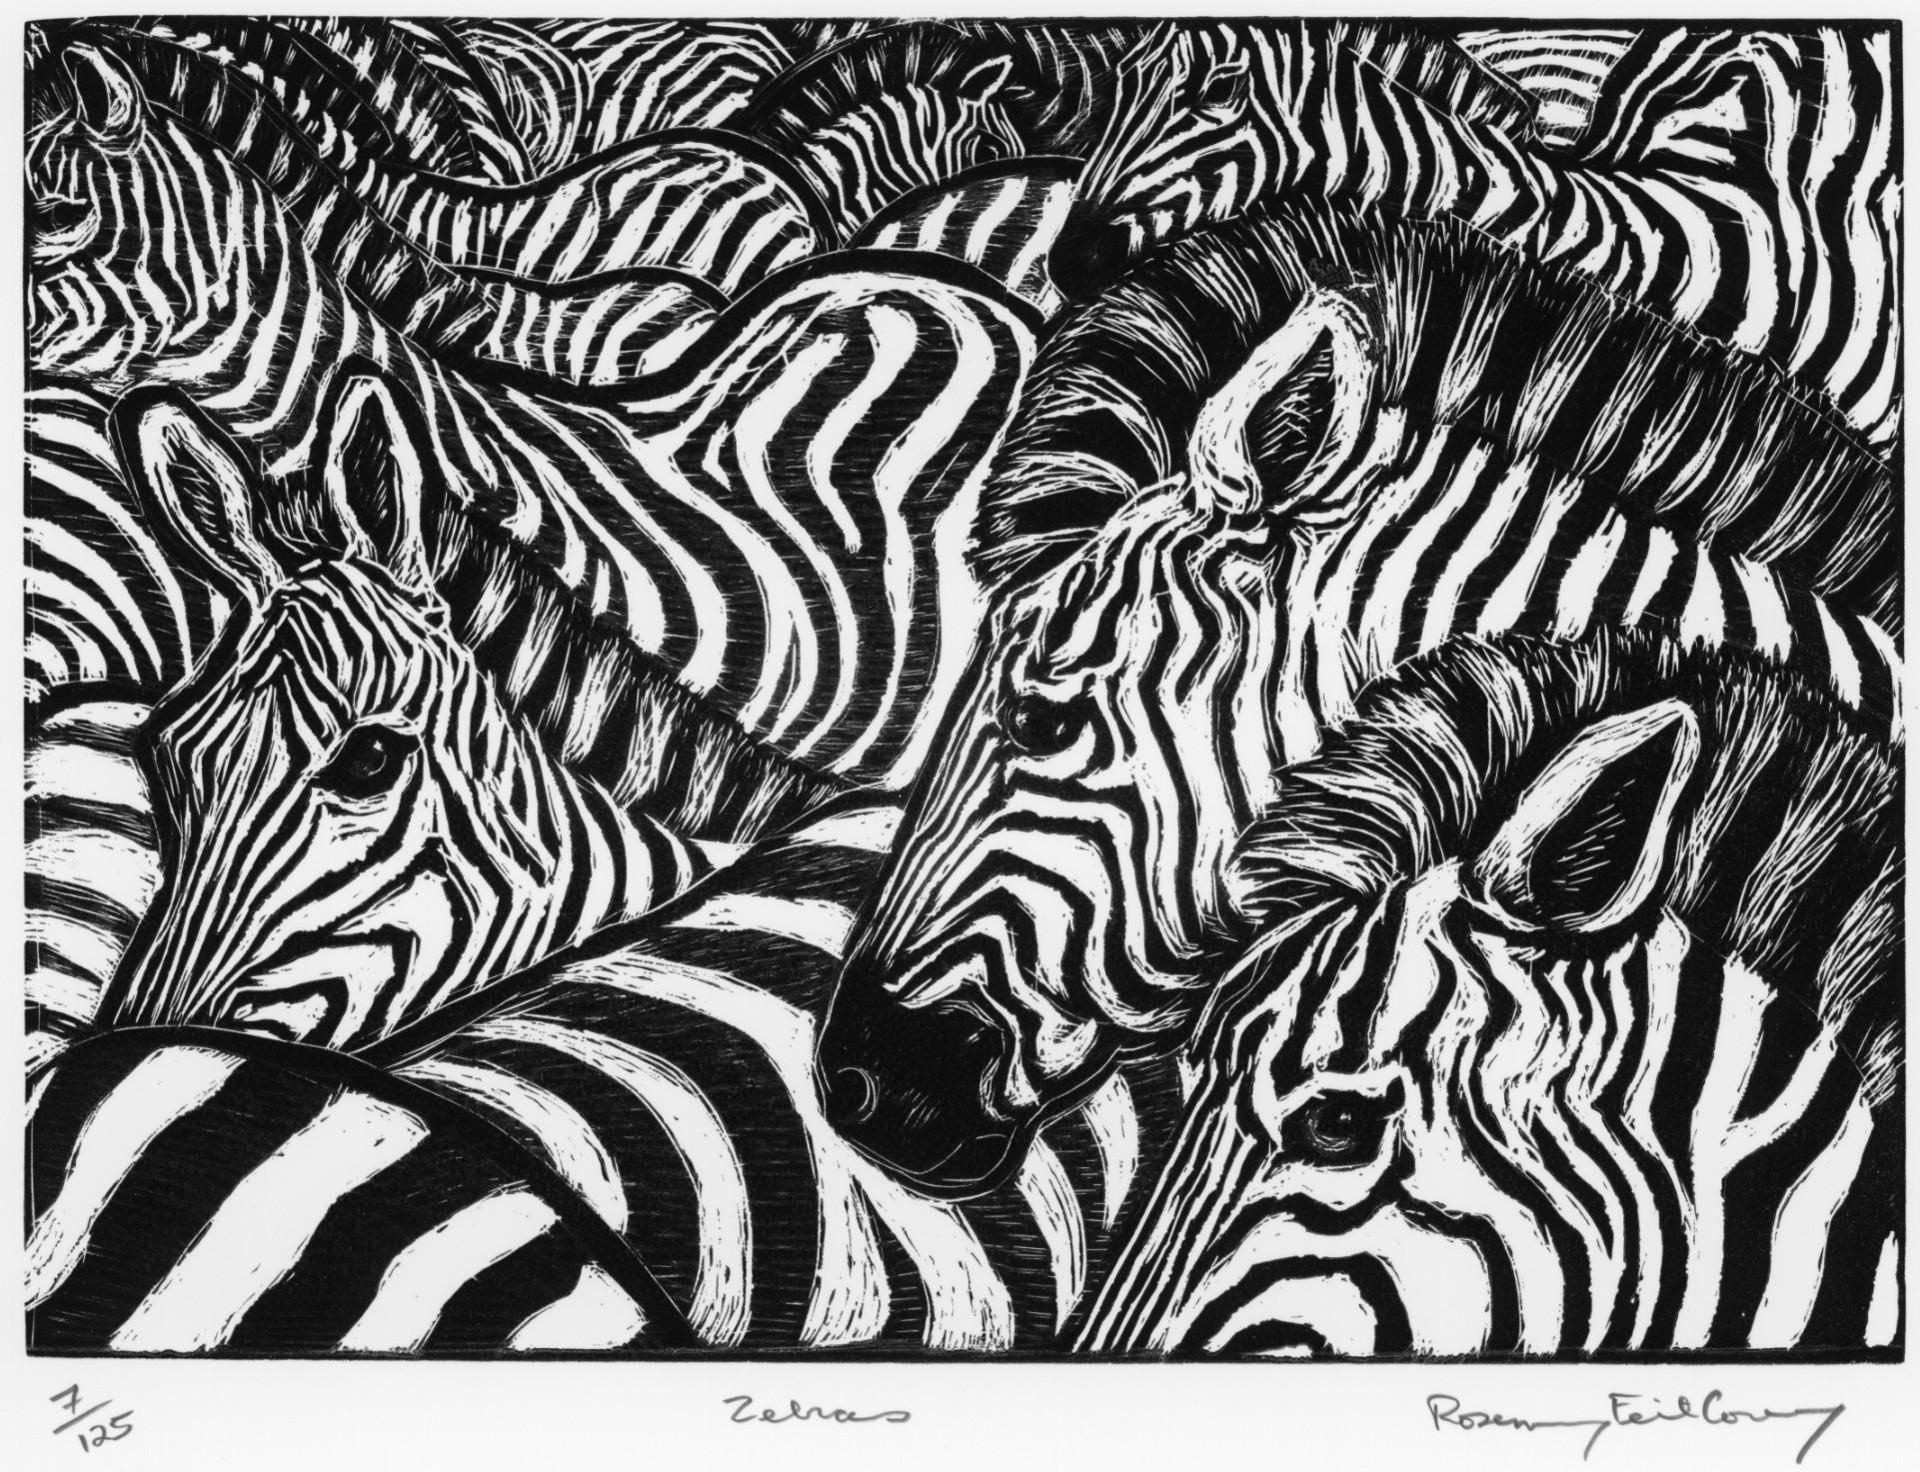 Zebras by Rosemary Feit Covey